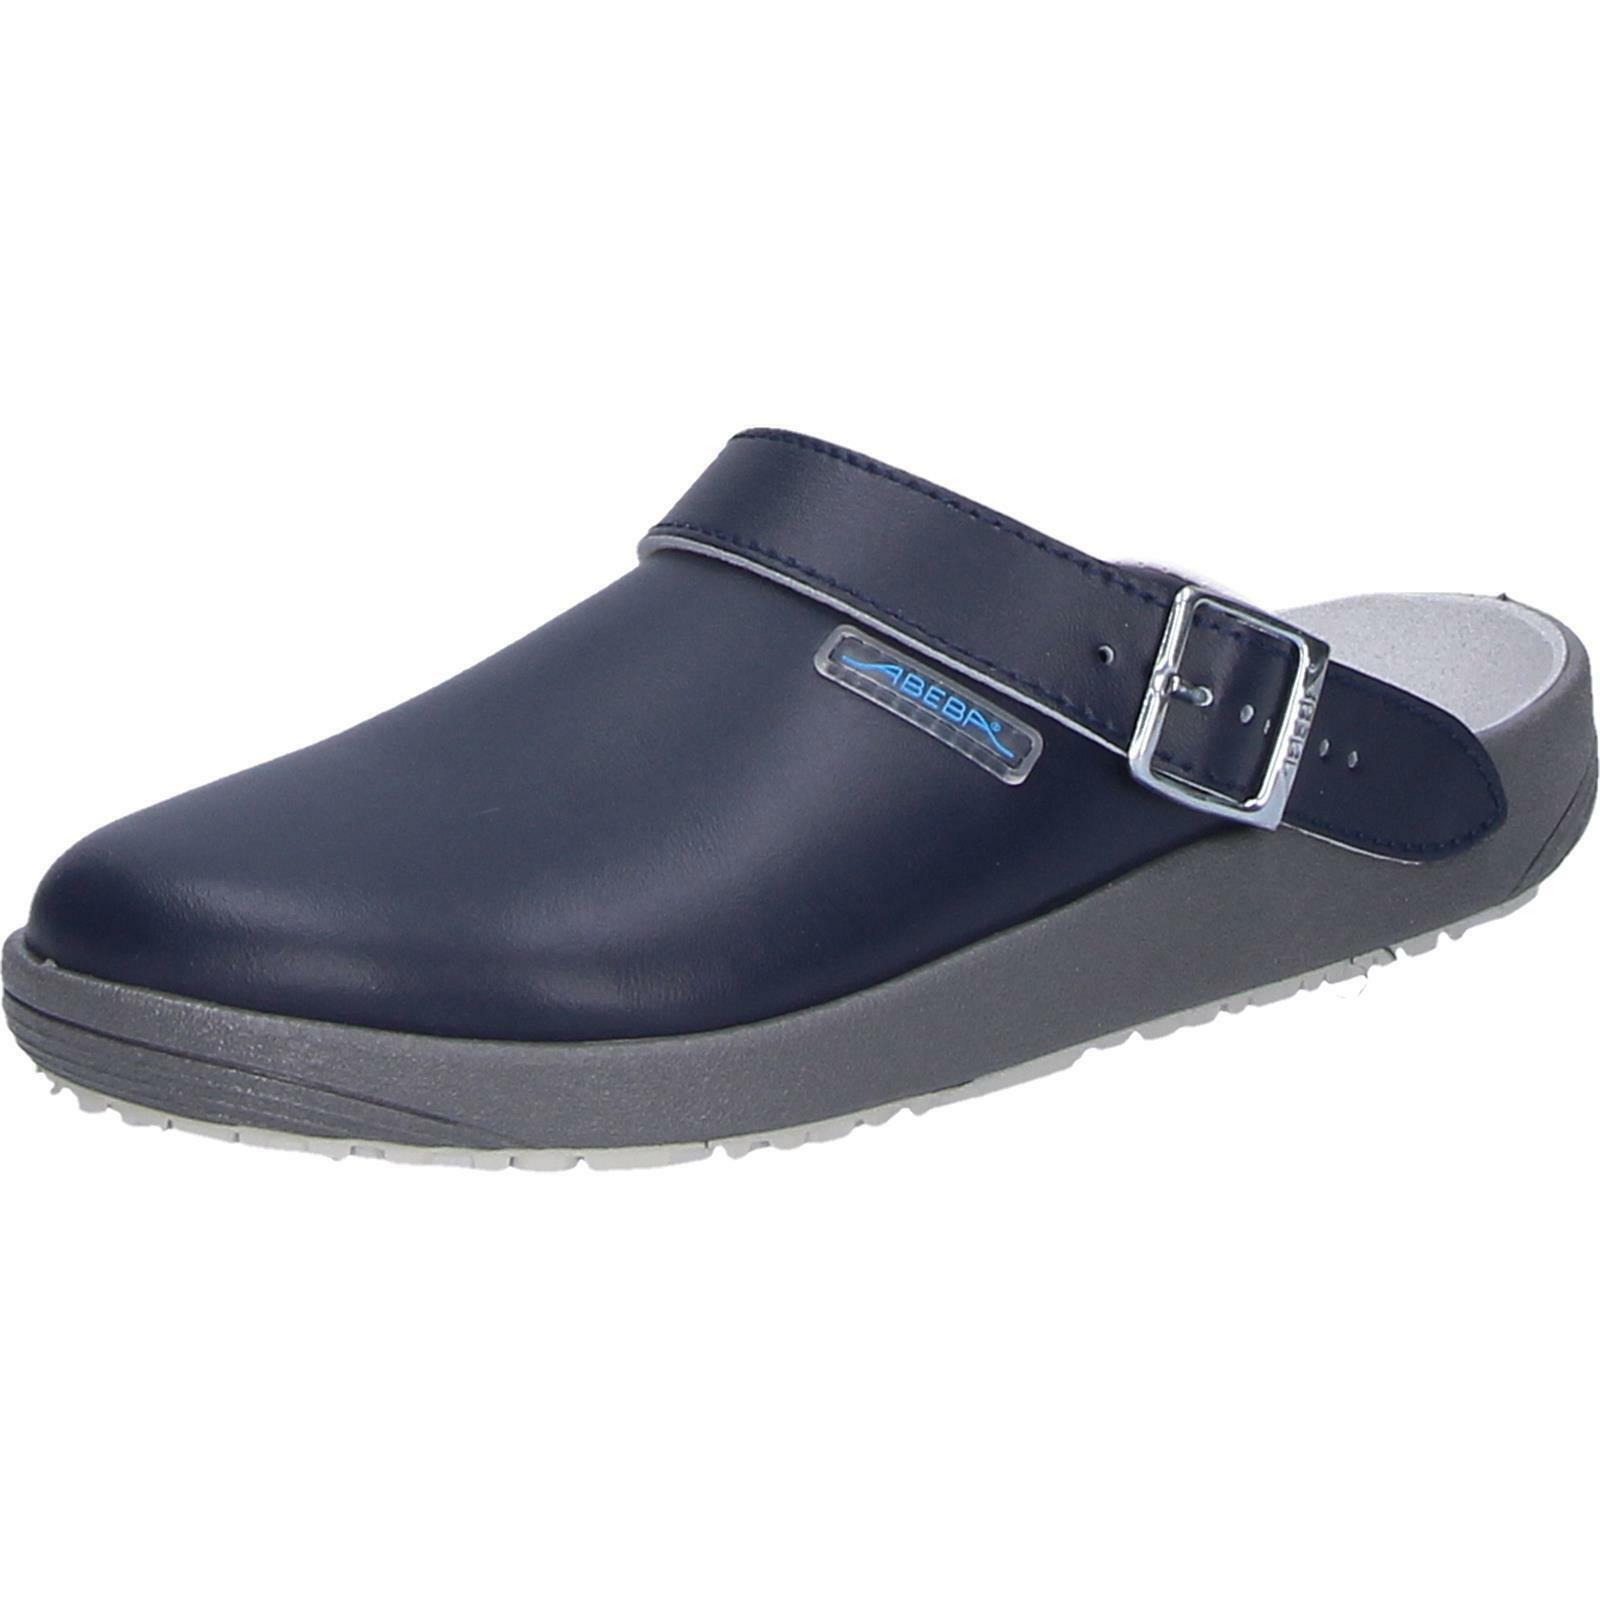 Abeba profesión zapatos zapatos de trabajo zapatos zapatillas Color marine talla 44